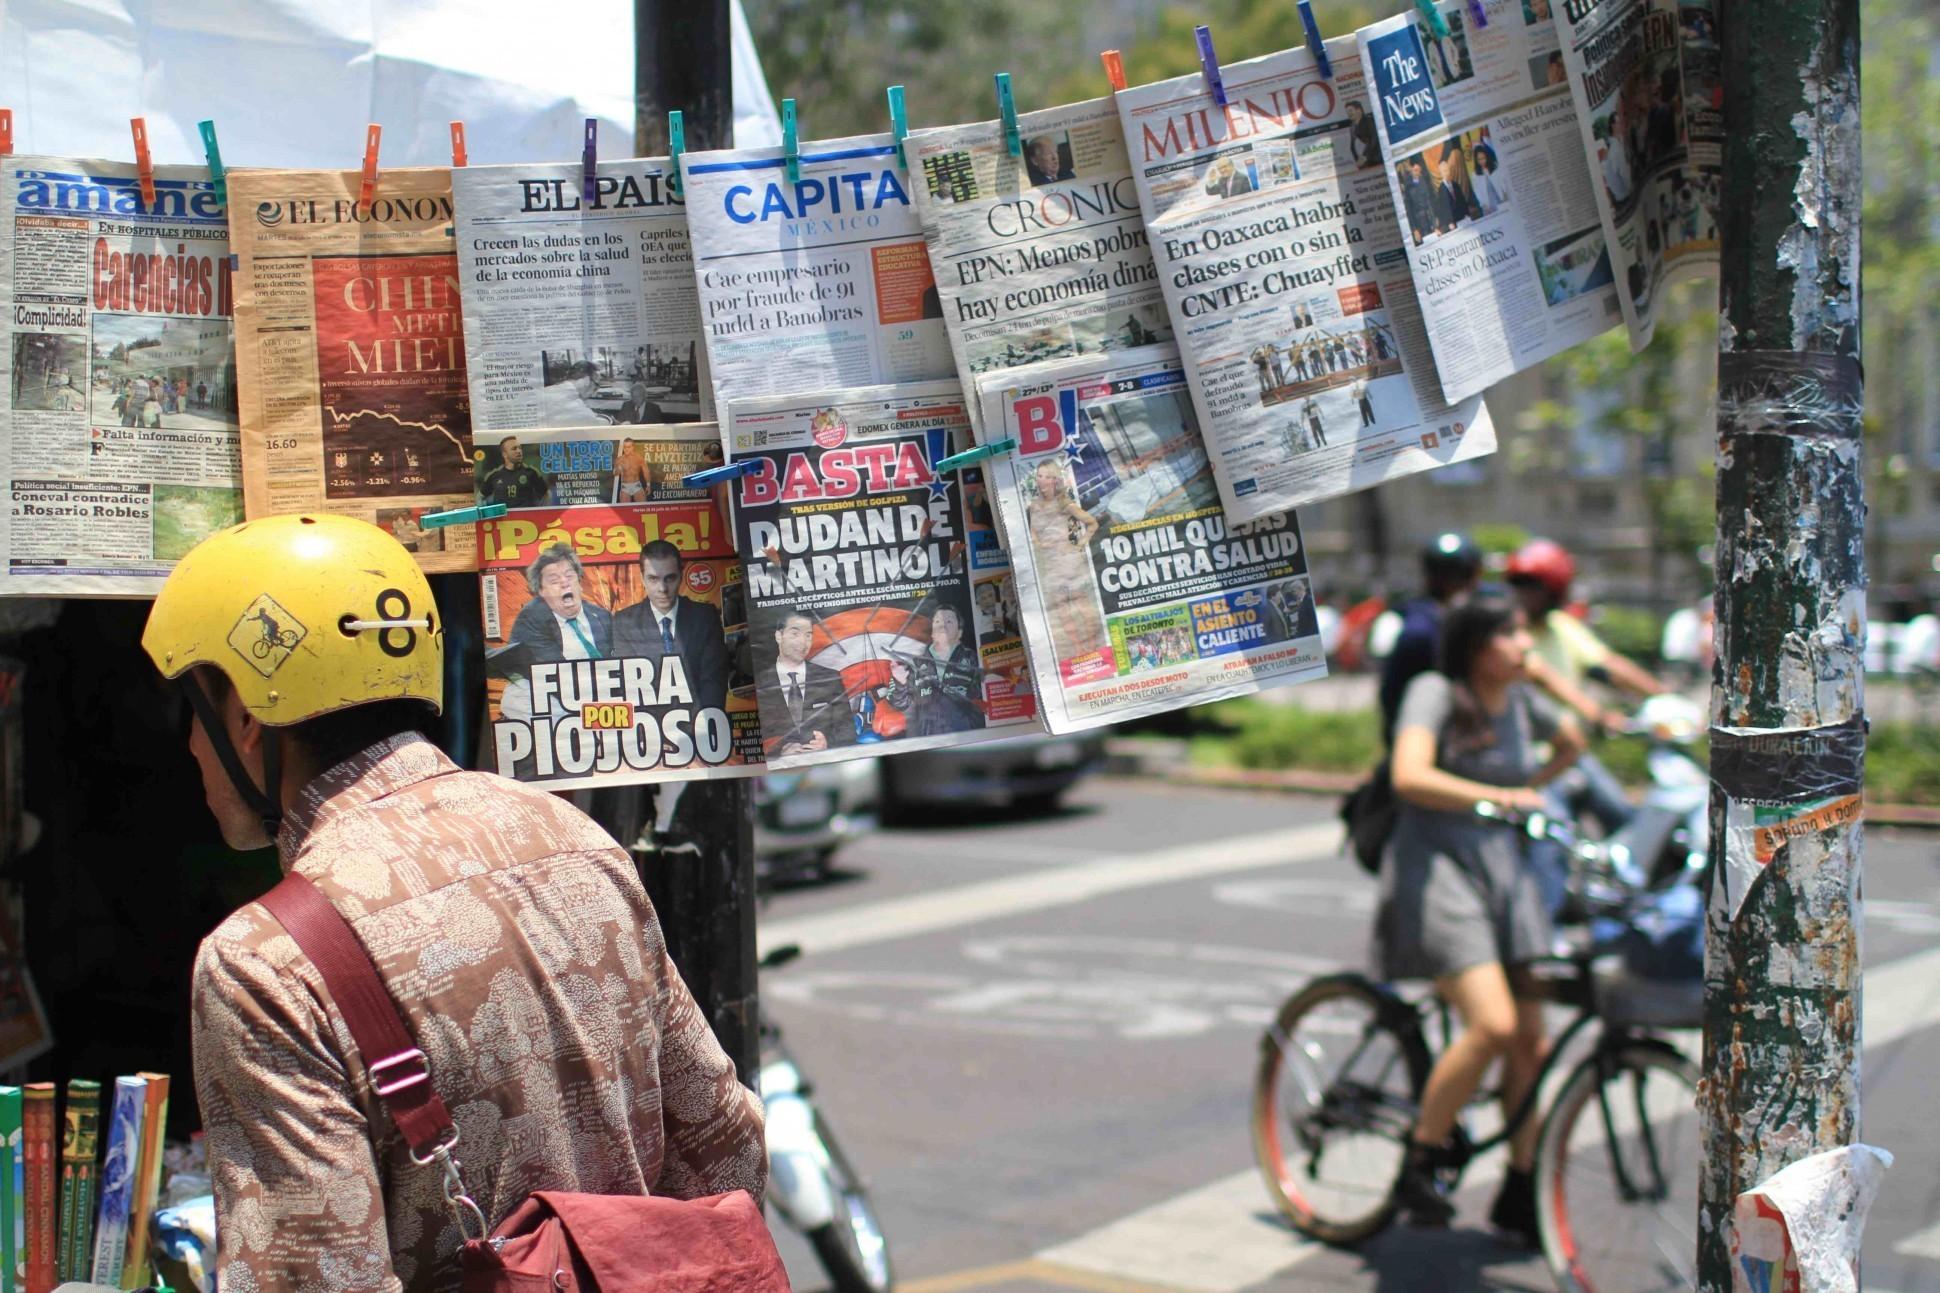 Global Newsroom: The Americas - Magazine cover